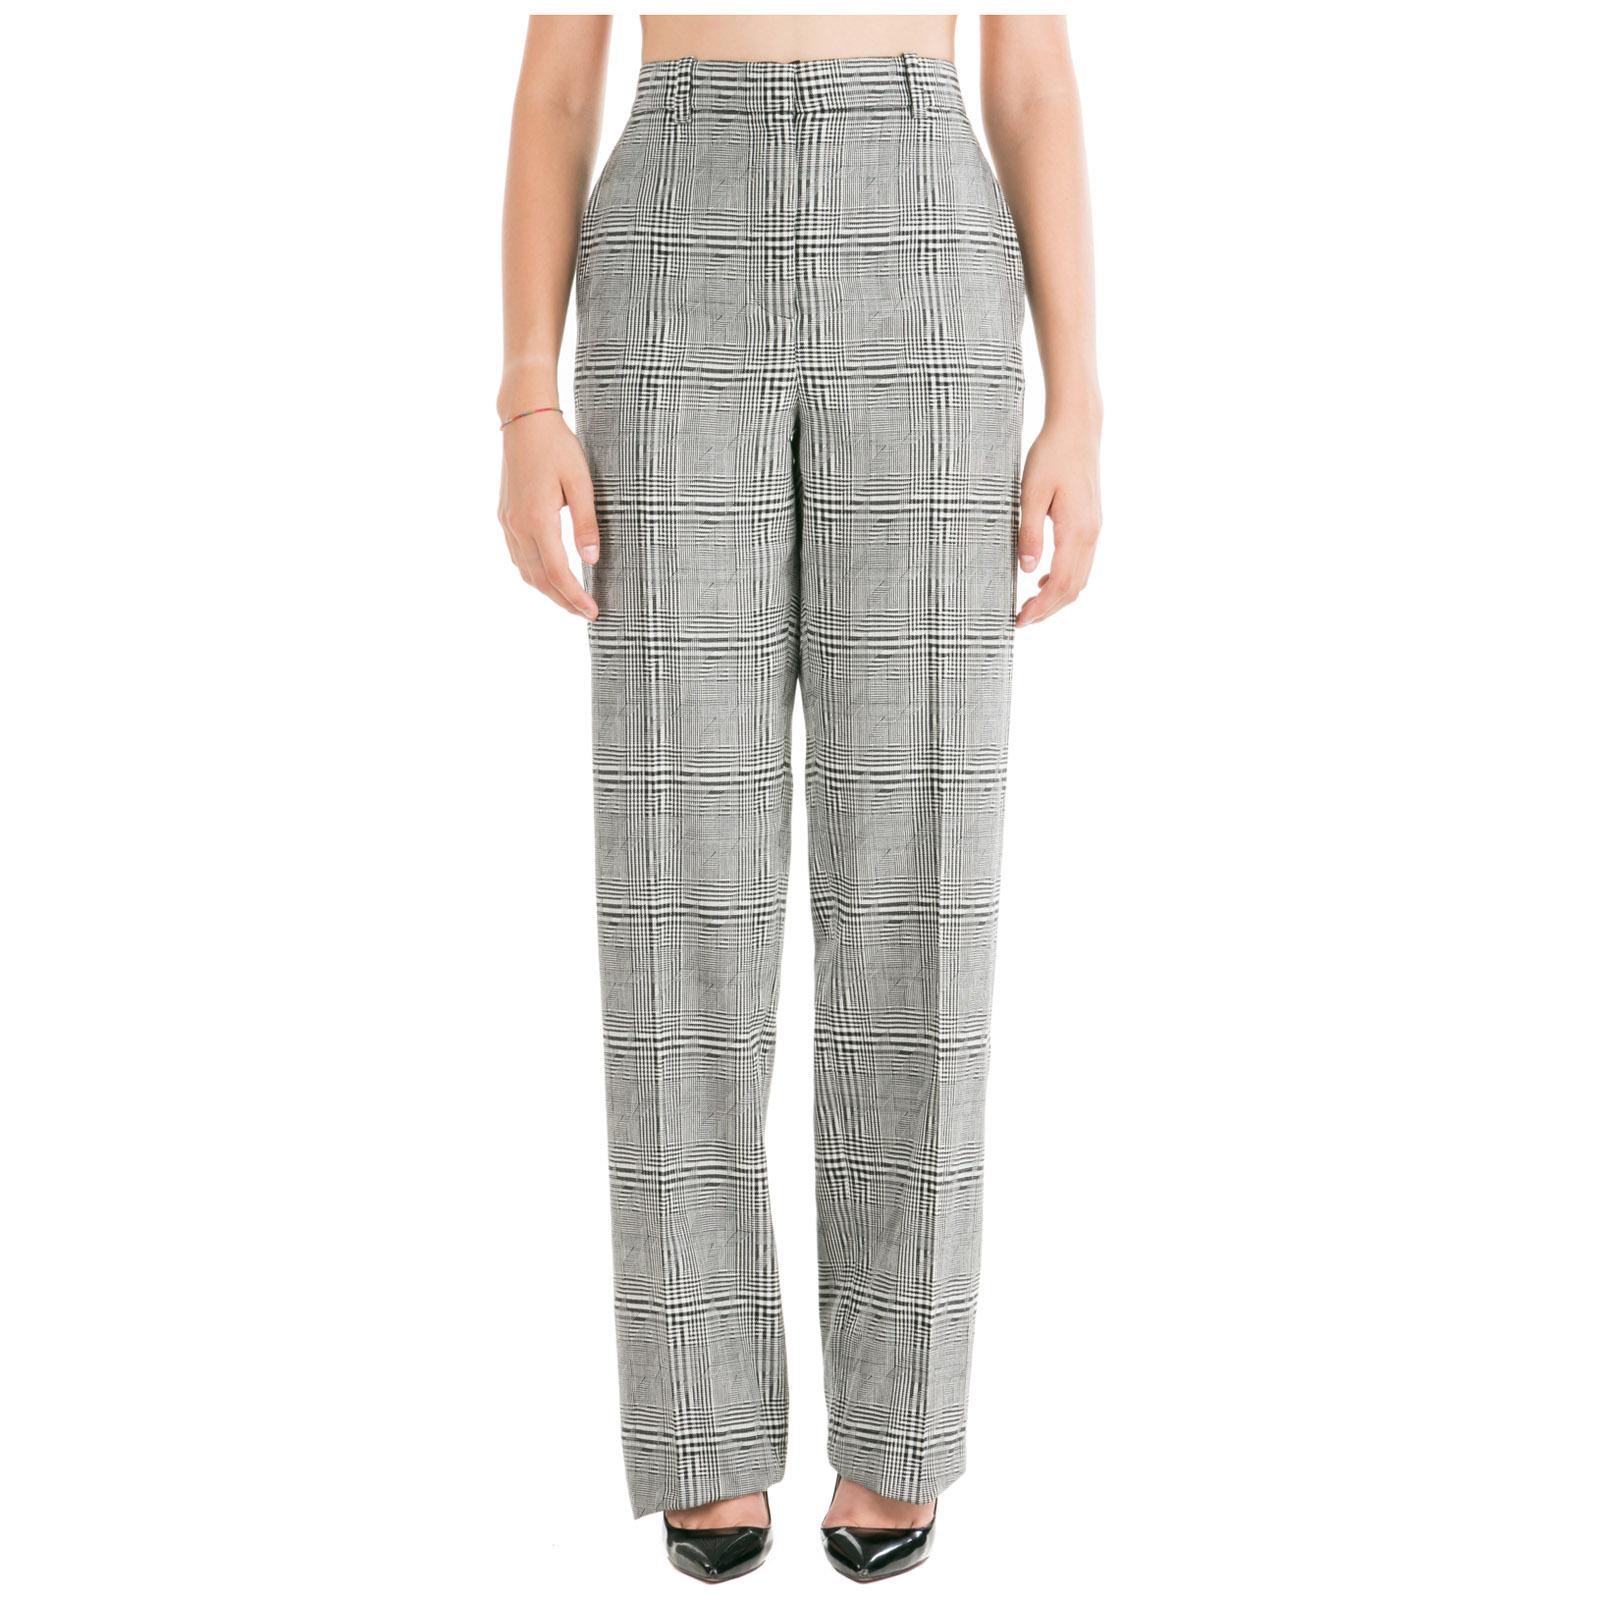 Versace Women's Trousers Pants In Grey